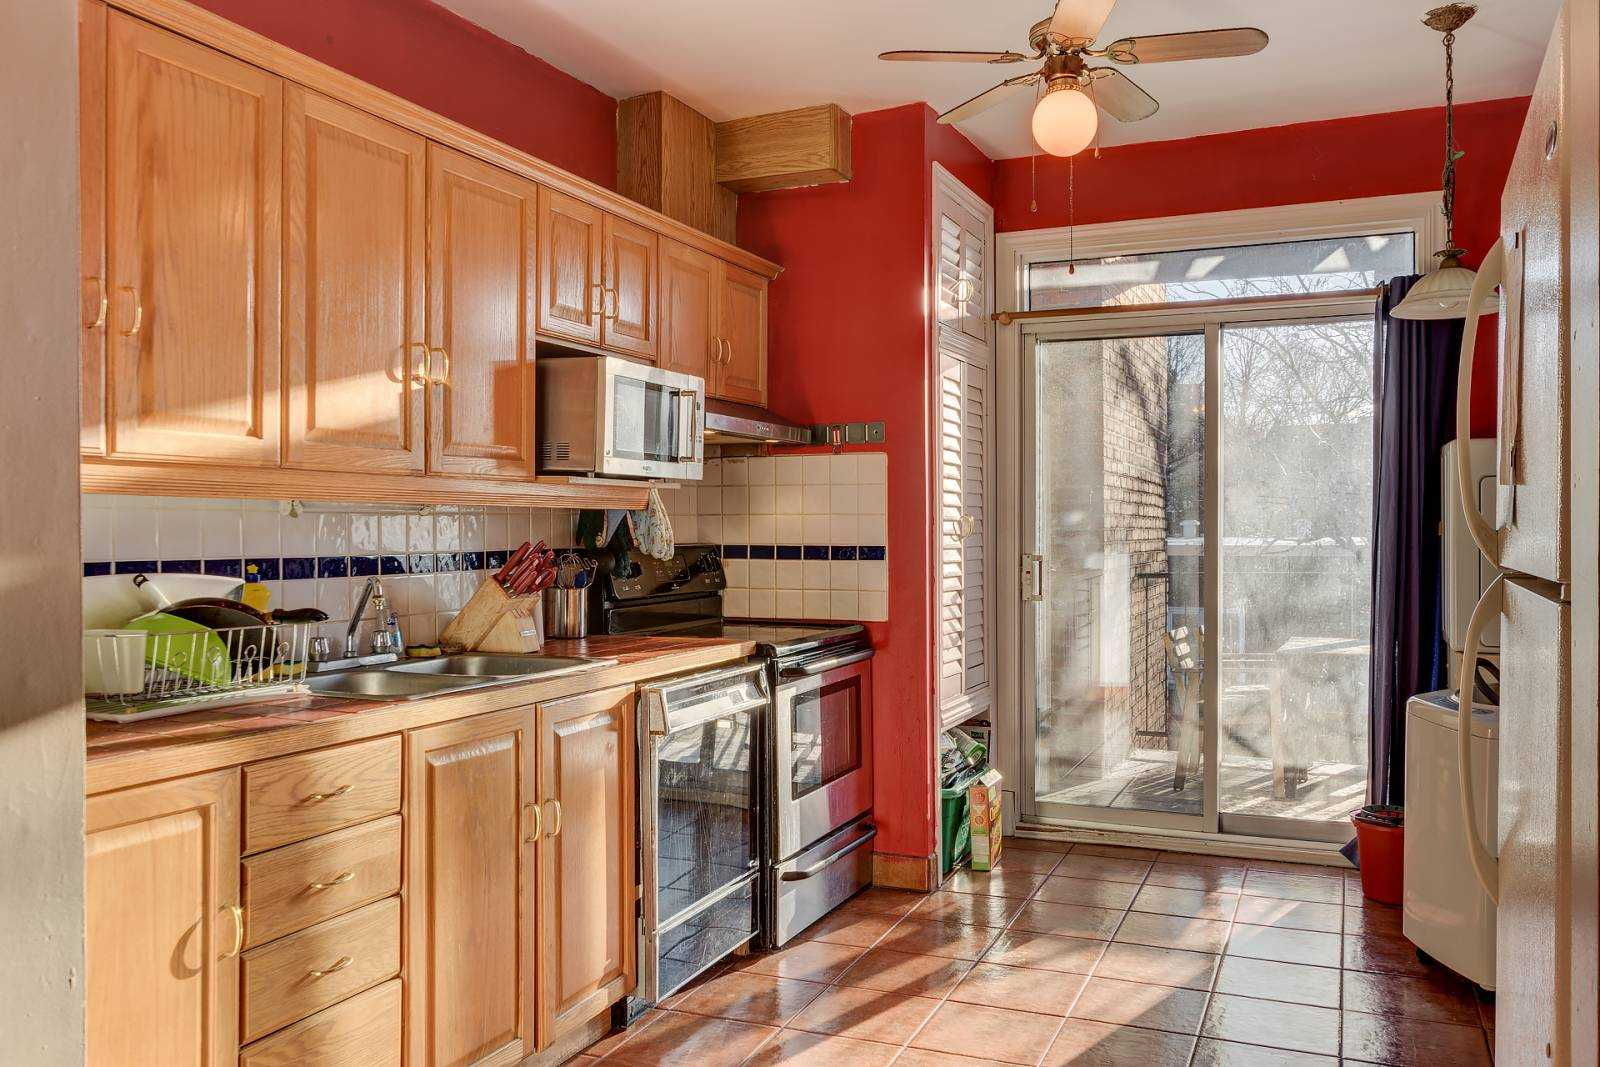 rooms-to-rent-mtl-kitchen